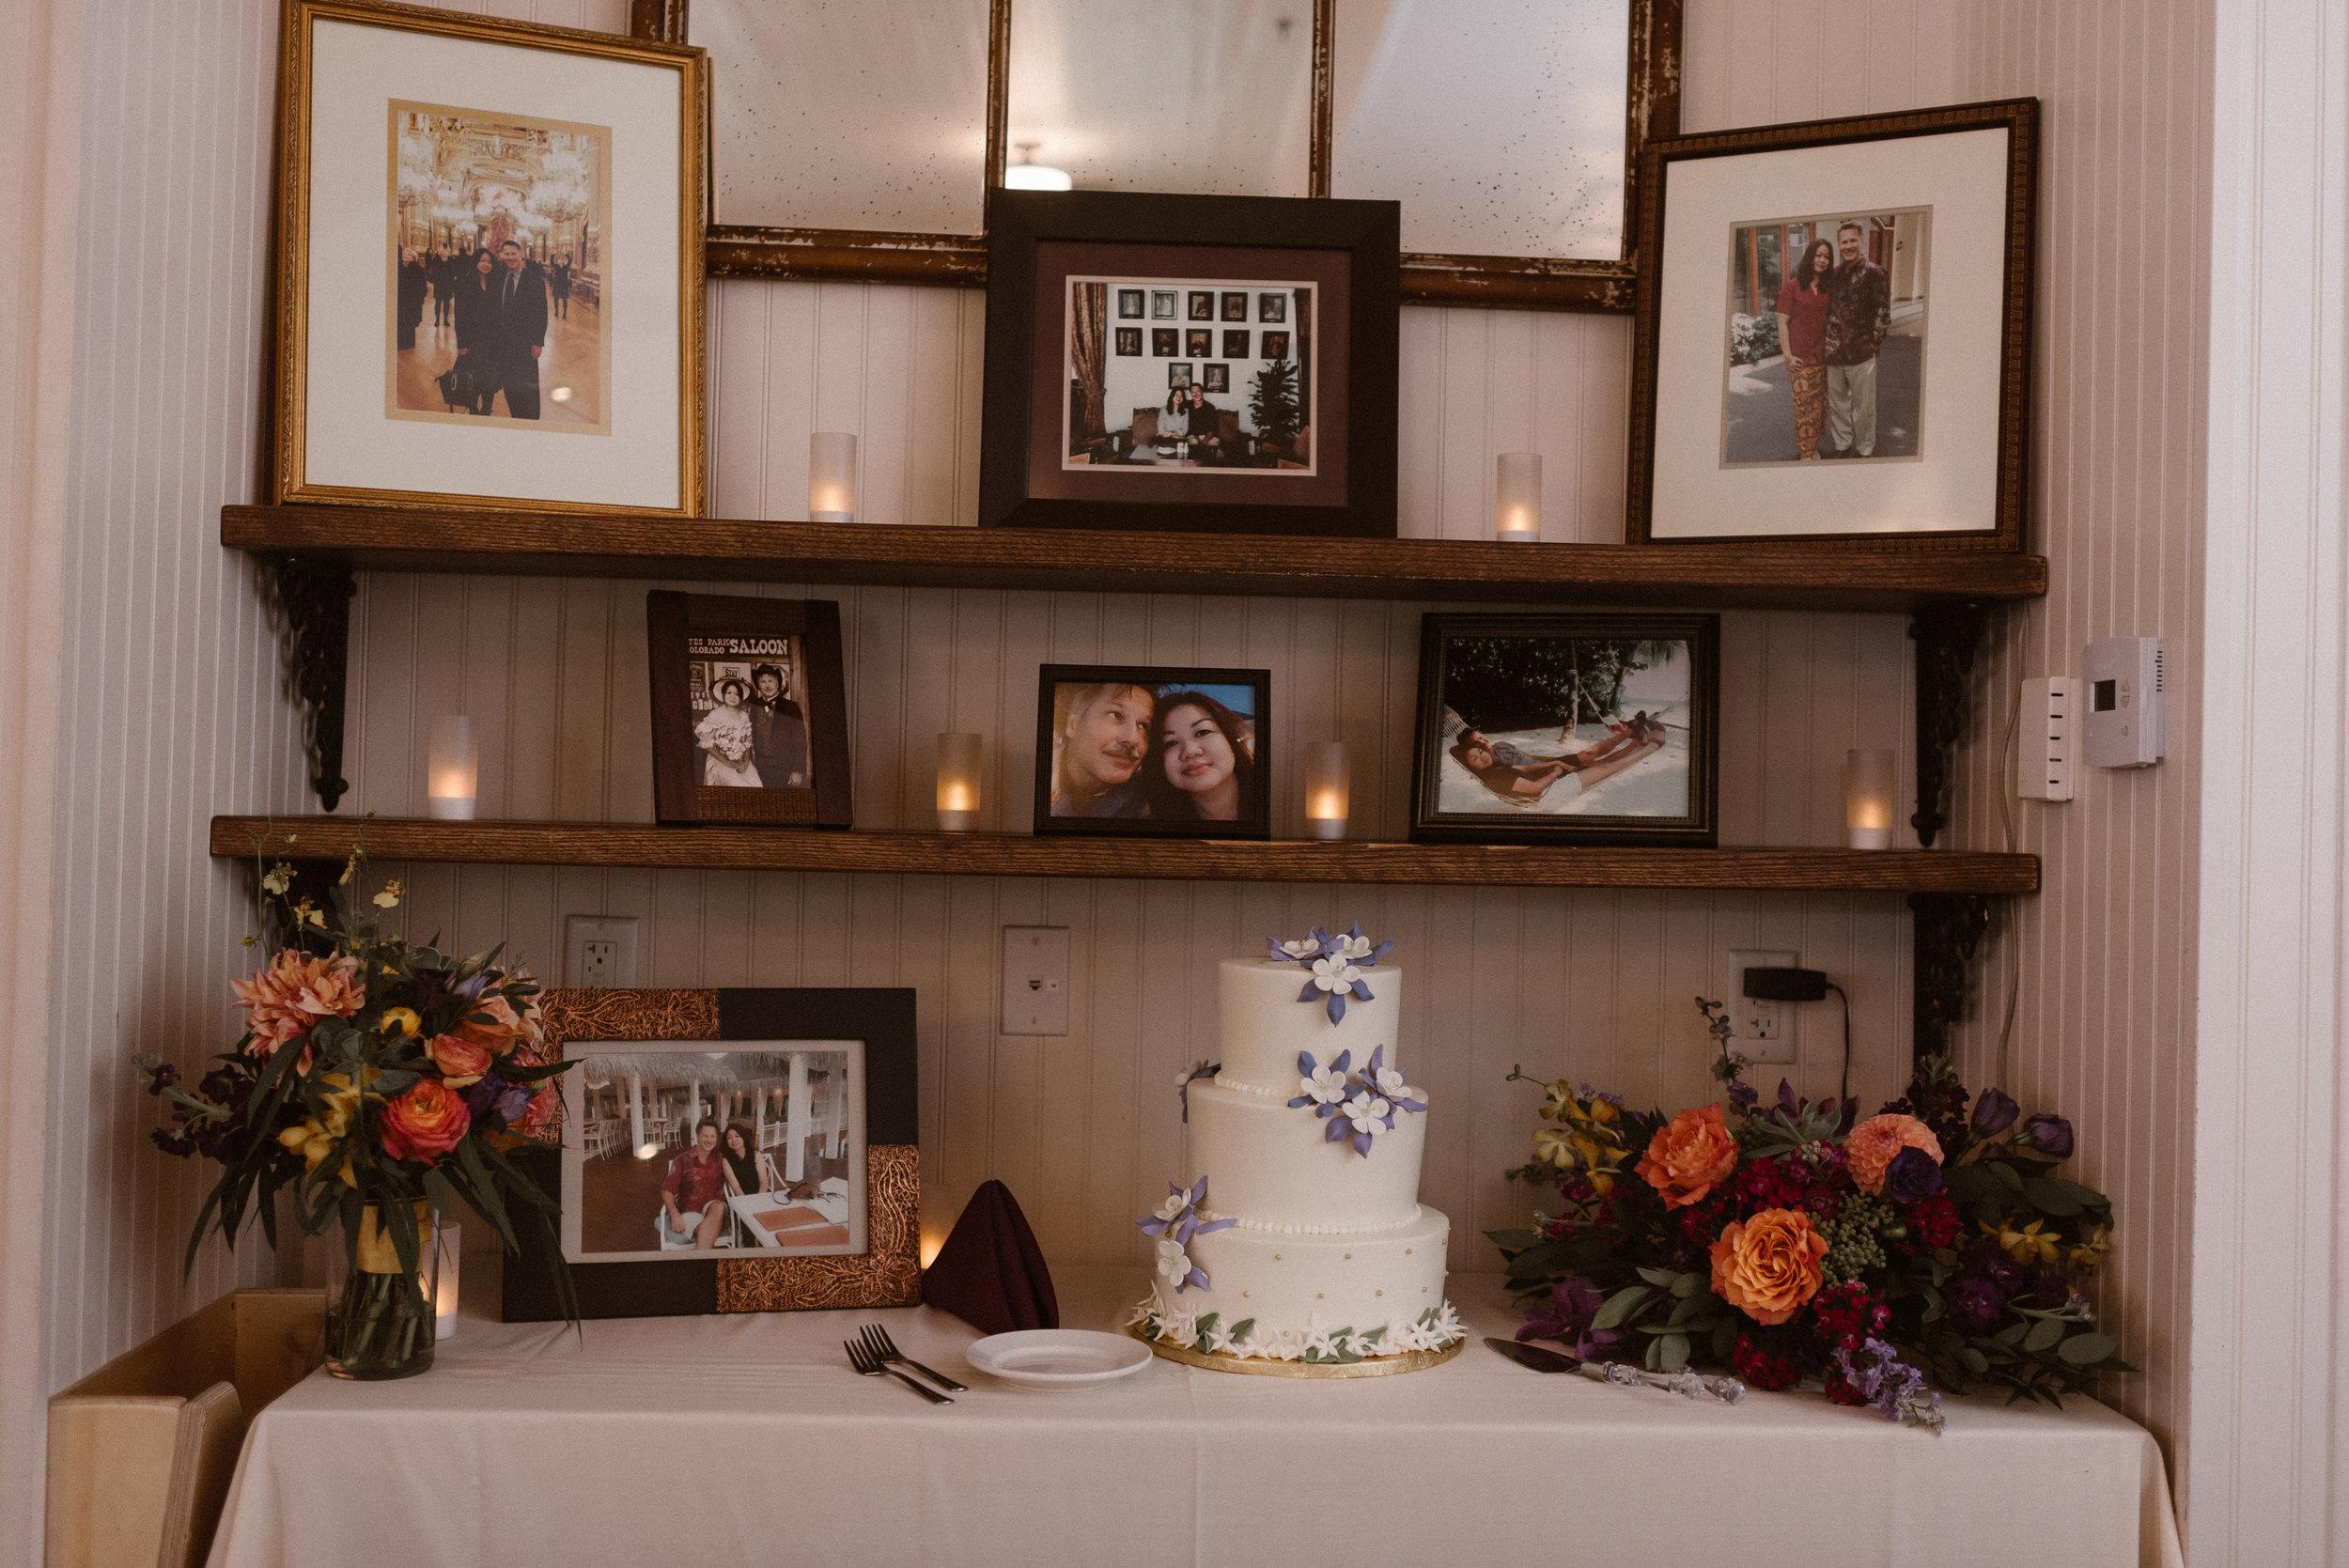 Cake and Photo Display